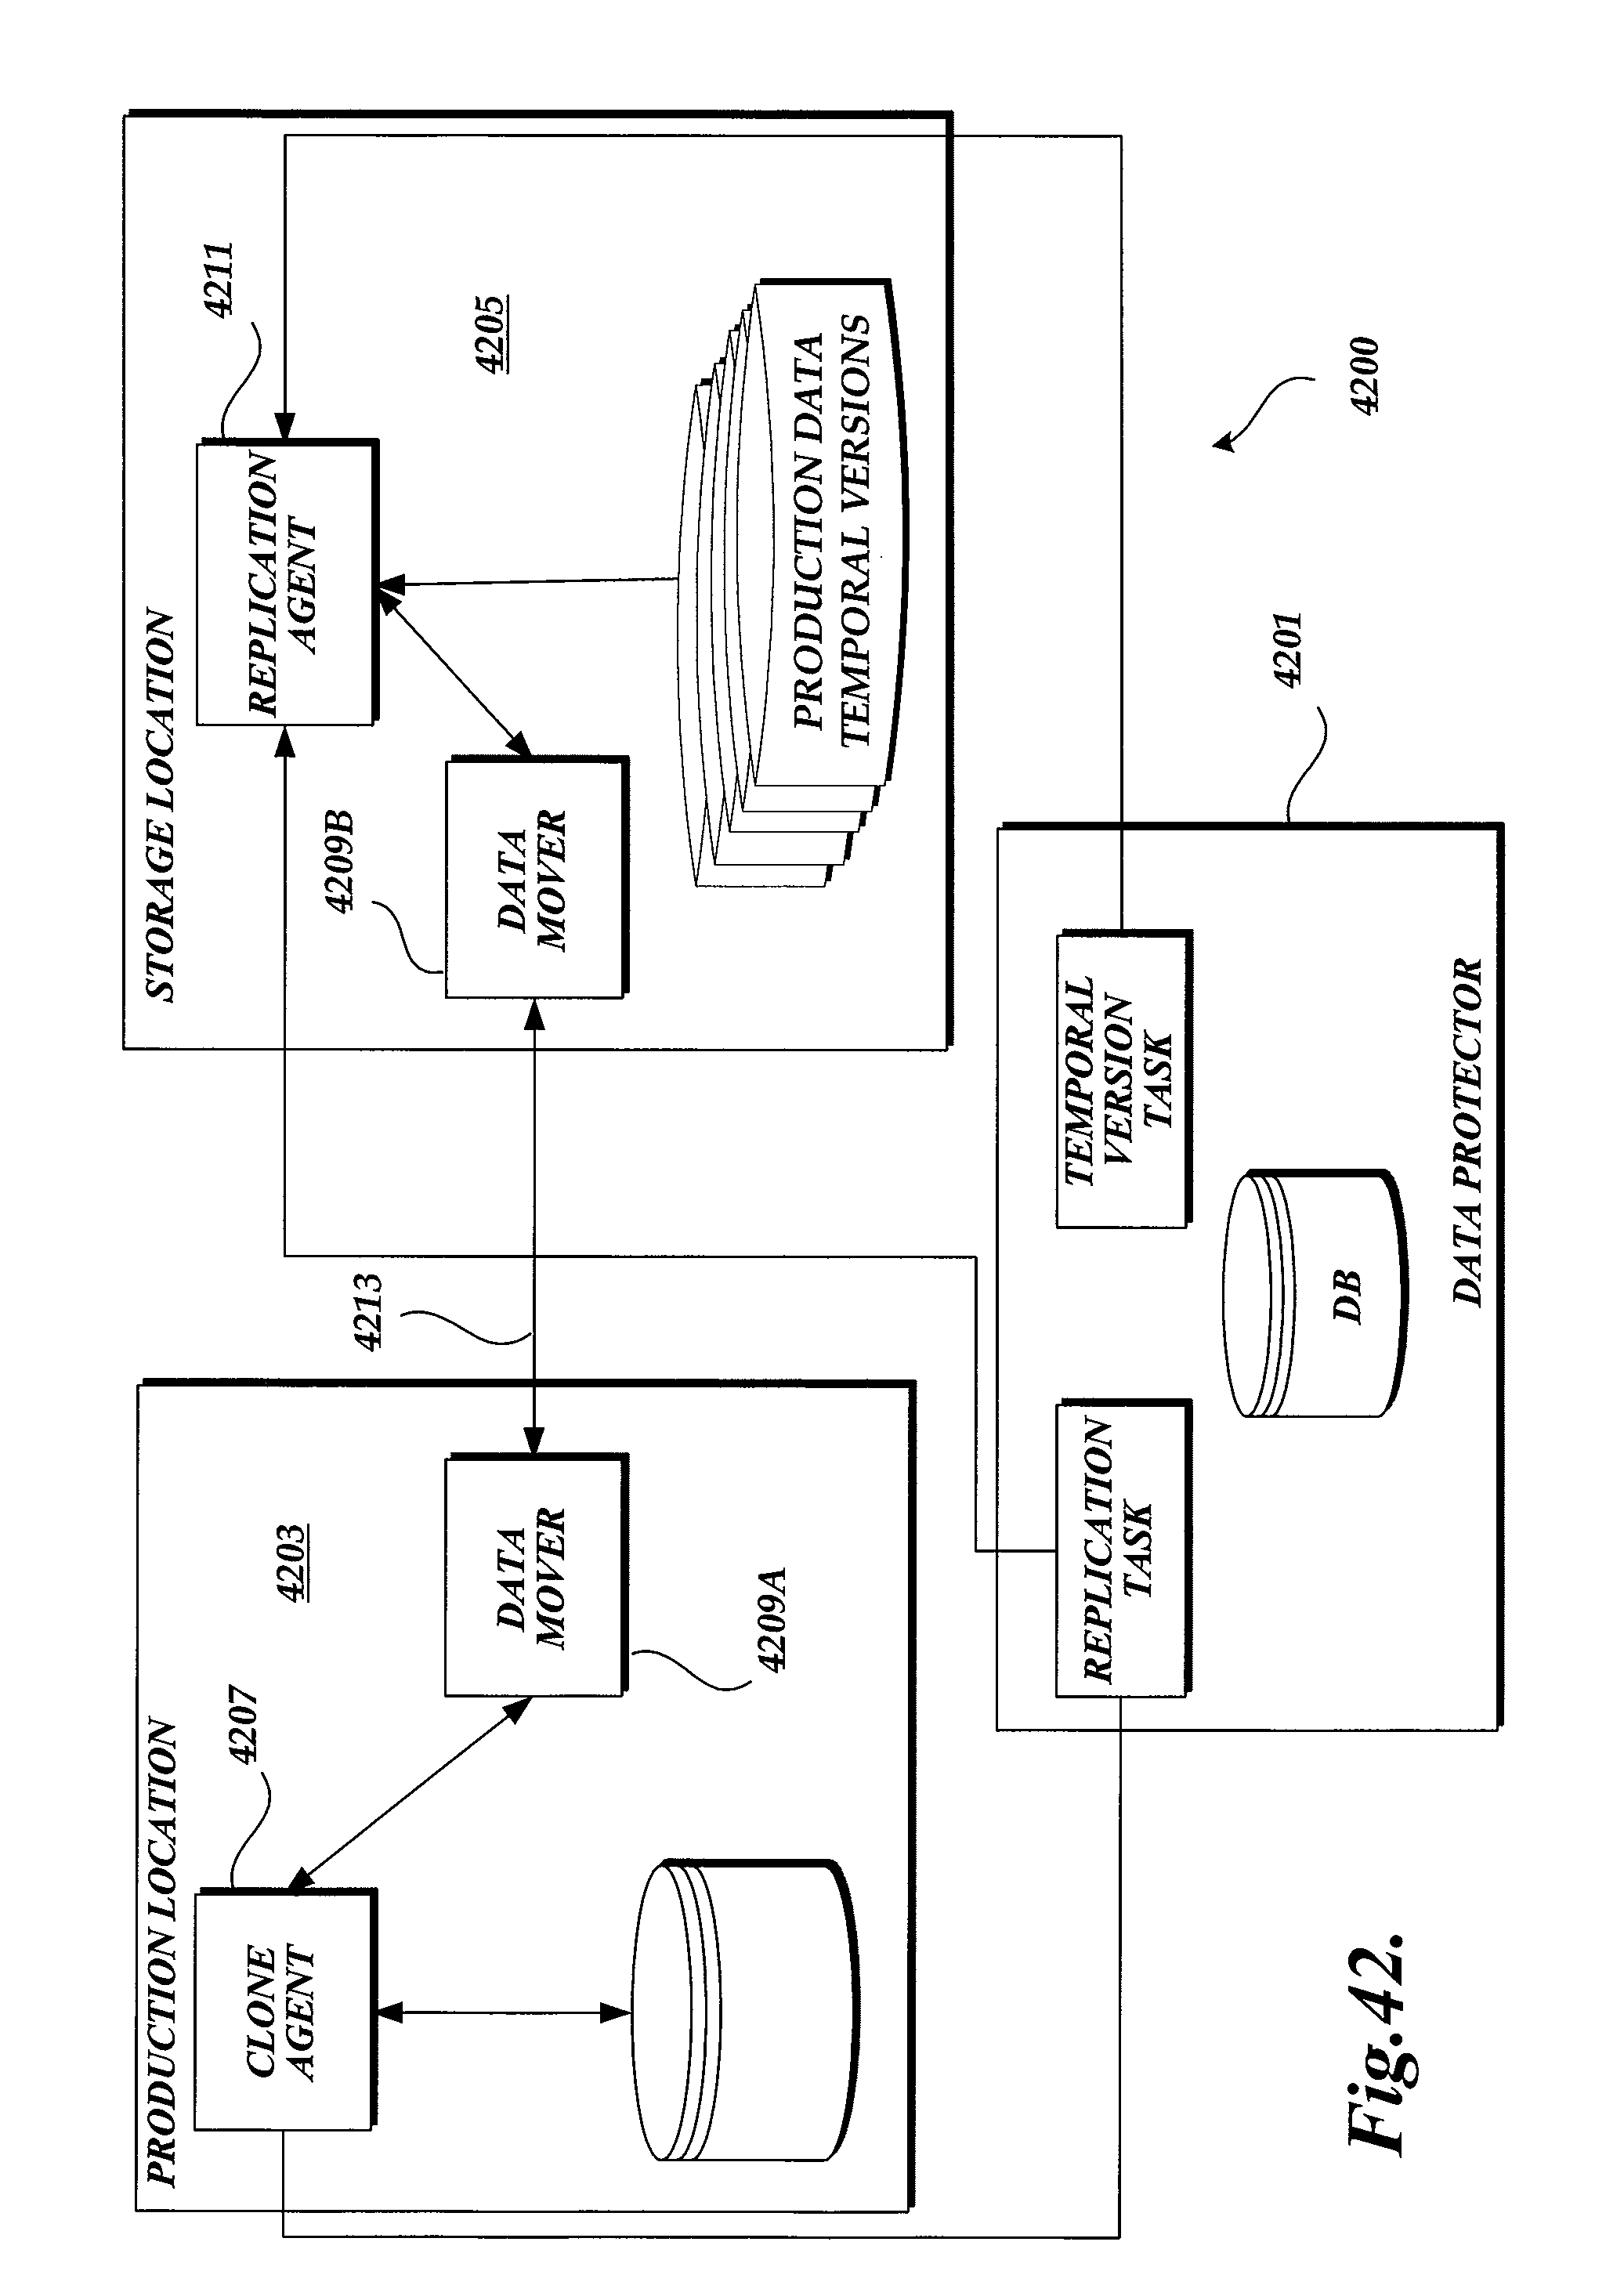 Patent US 8,078,587 B2